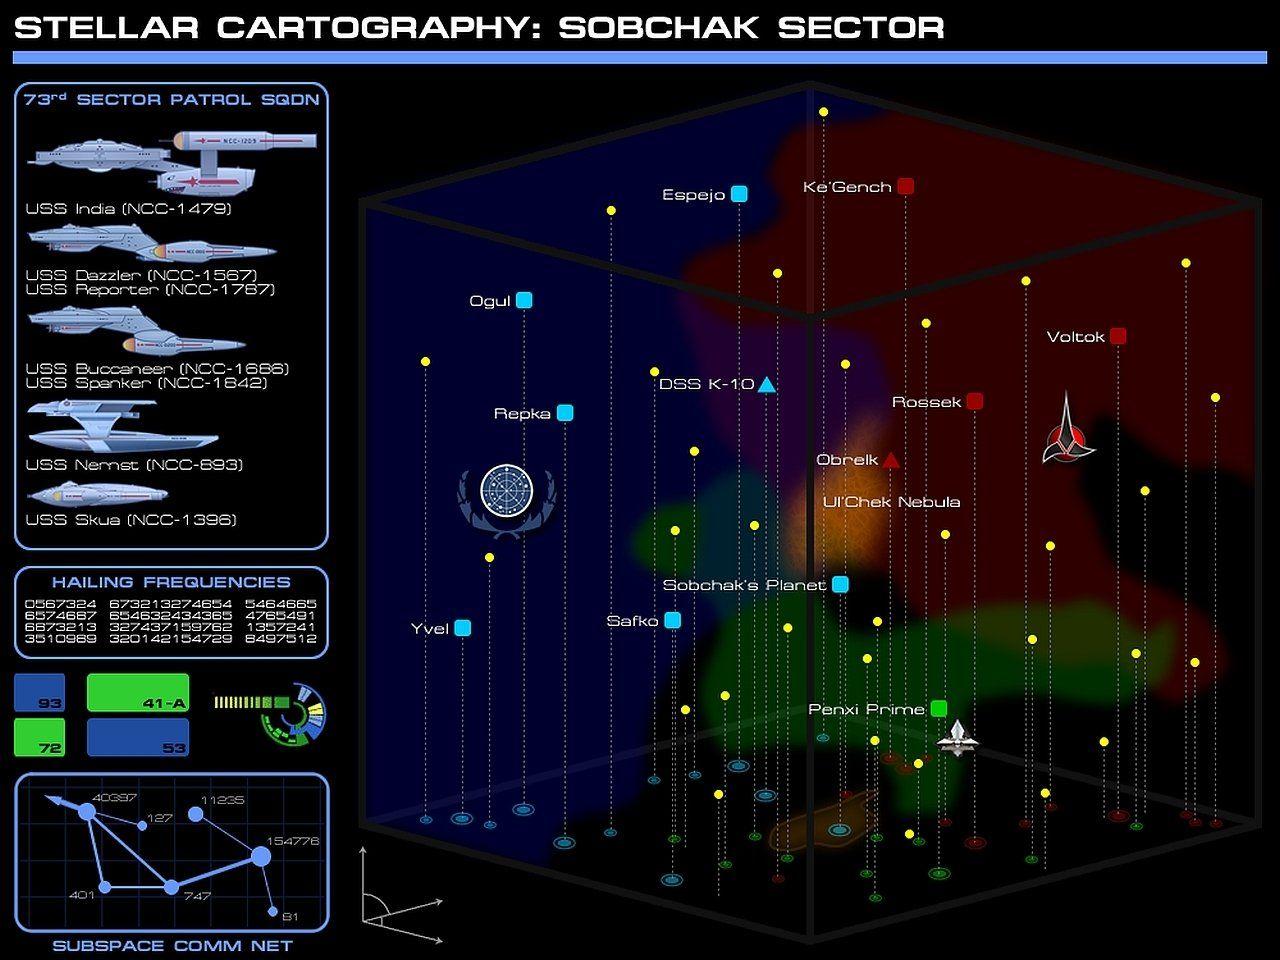 1280x960 Star Trek Wallpaper Background Image. View